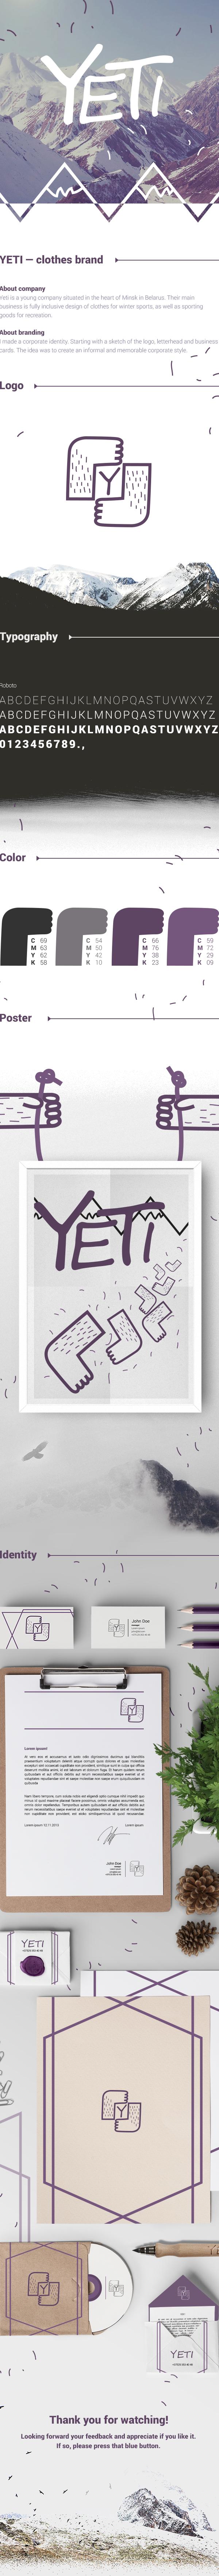 yeti logo clothes Corporate Identity business card media